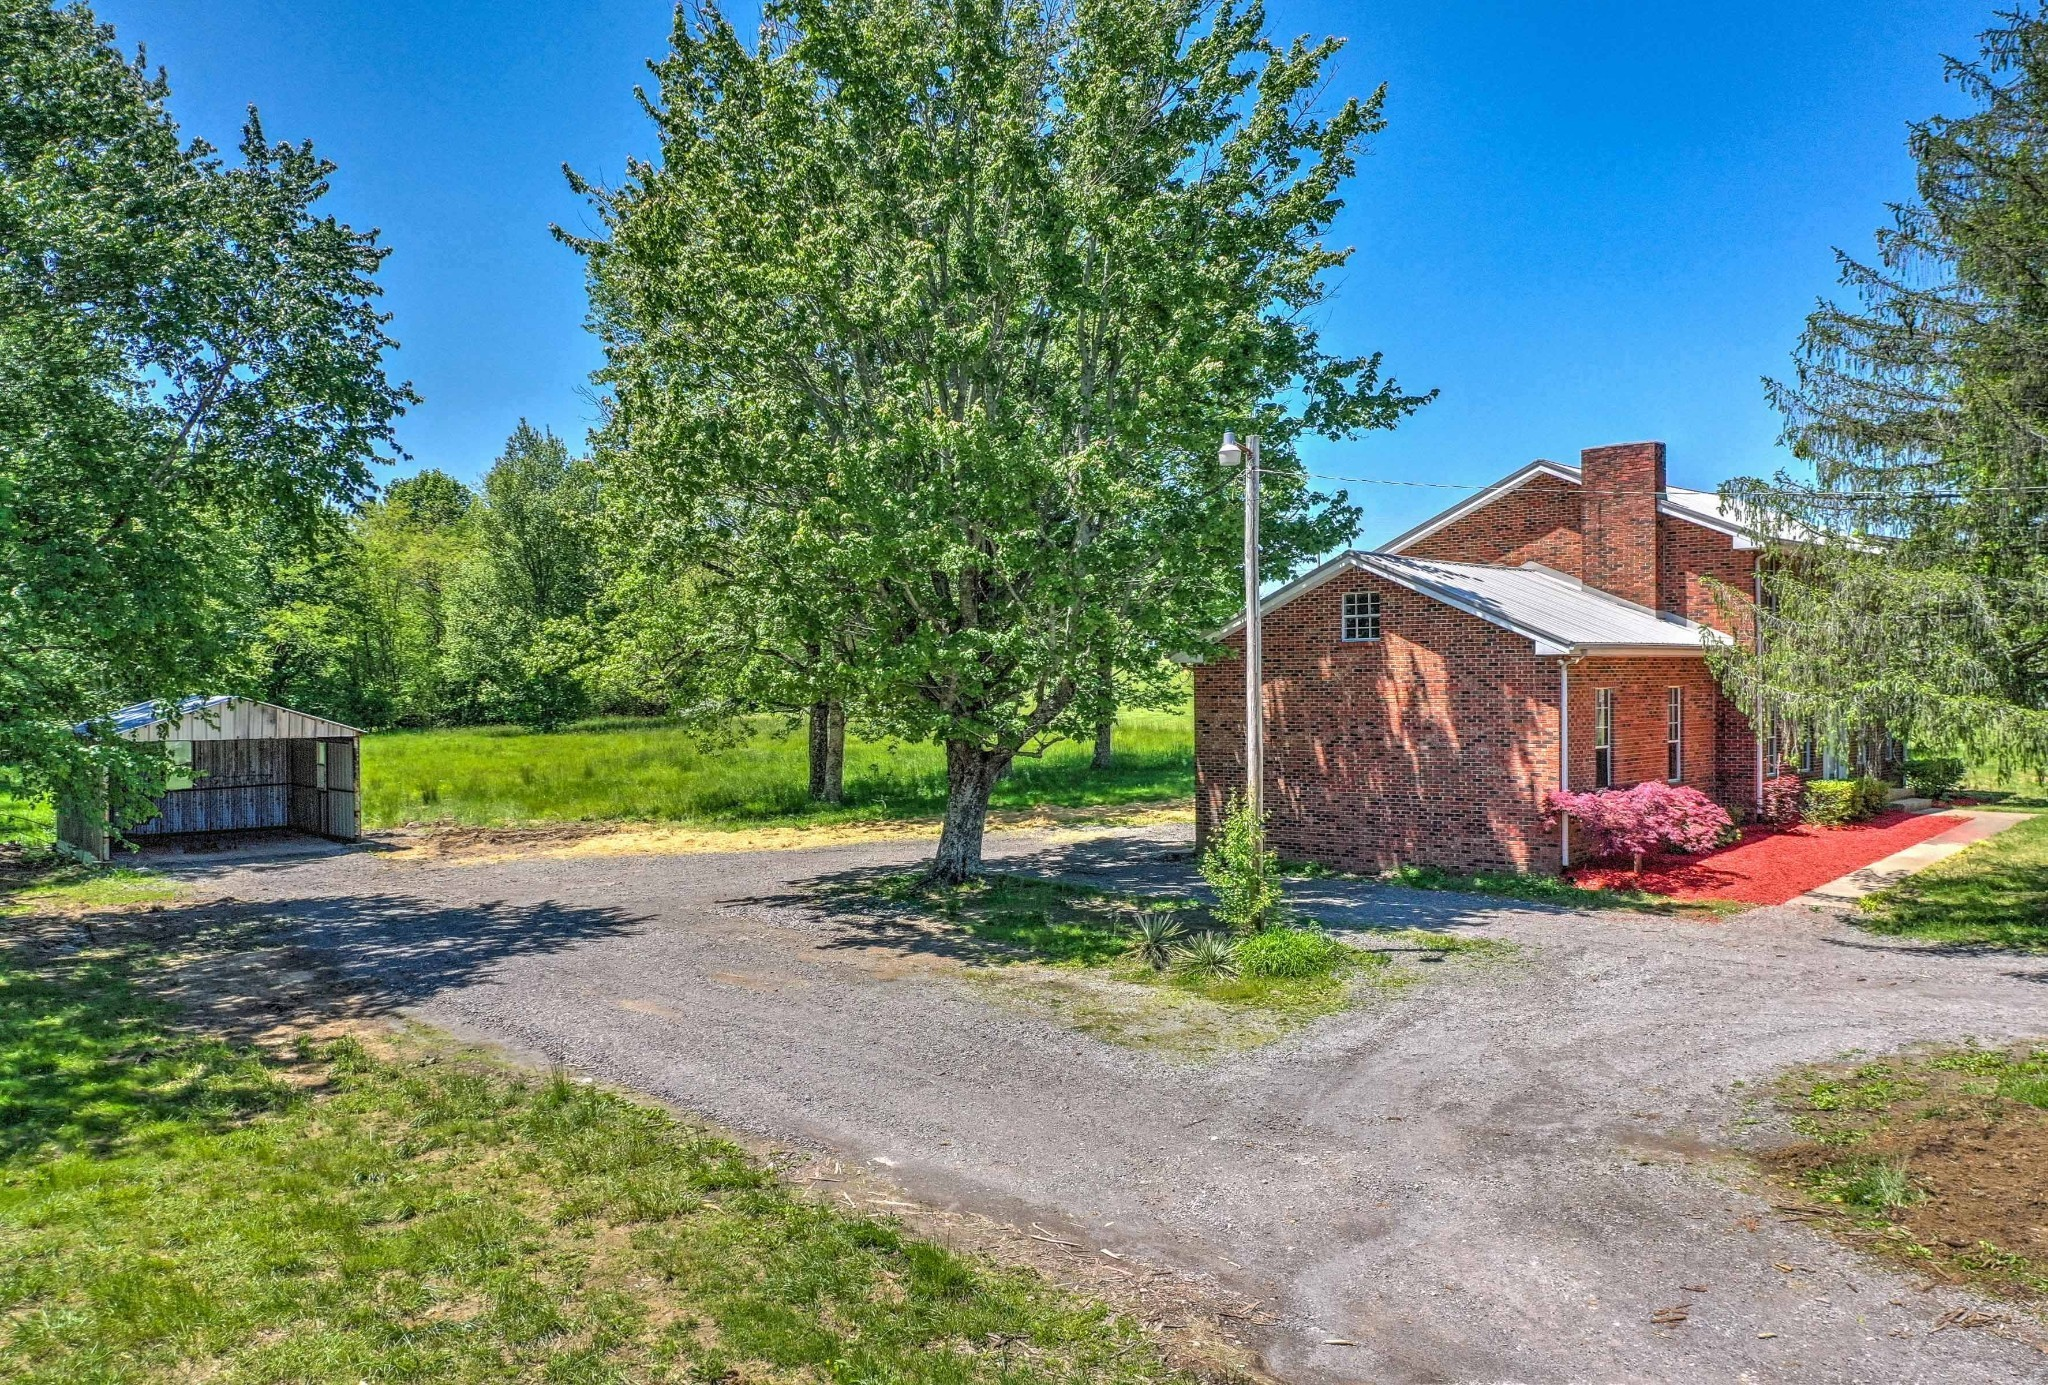 843 Halltown Rd Property Photo - Portland, TN real estate listing